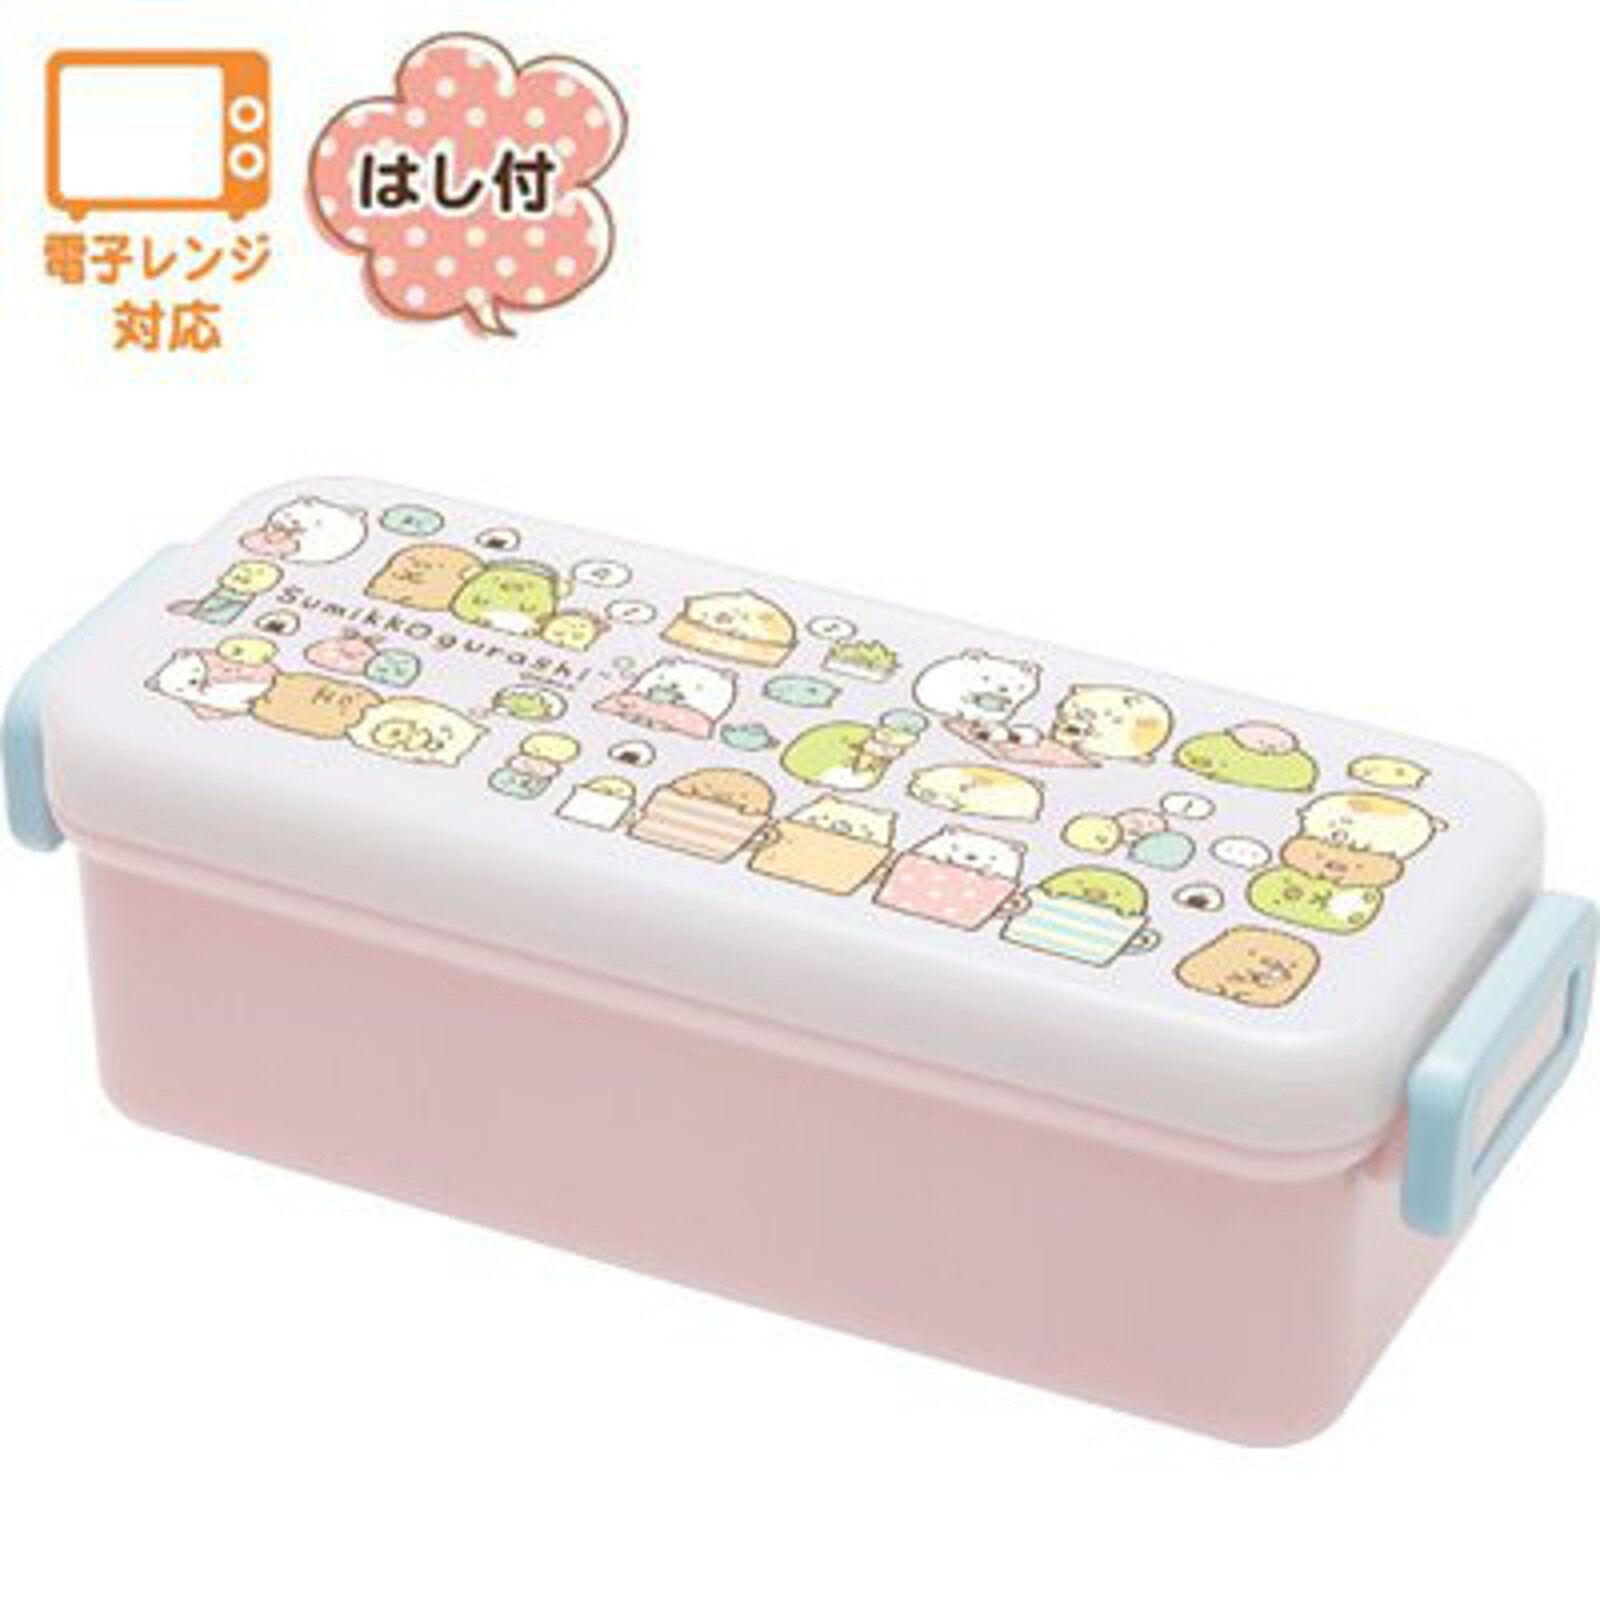 san x sumikko gurashi lunch food container bento box with chopsticks 540ml japan ebay. Black Bedroom Furniture Sets. Home Design Ideas